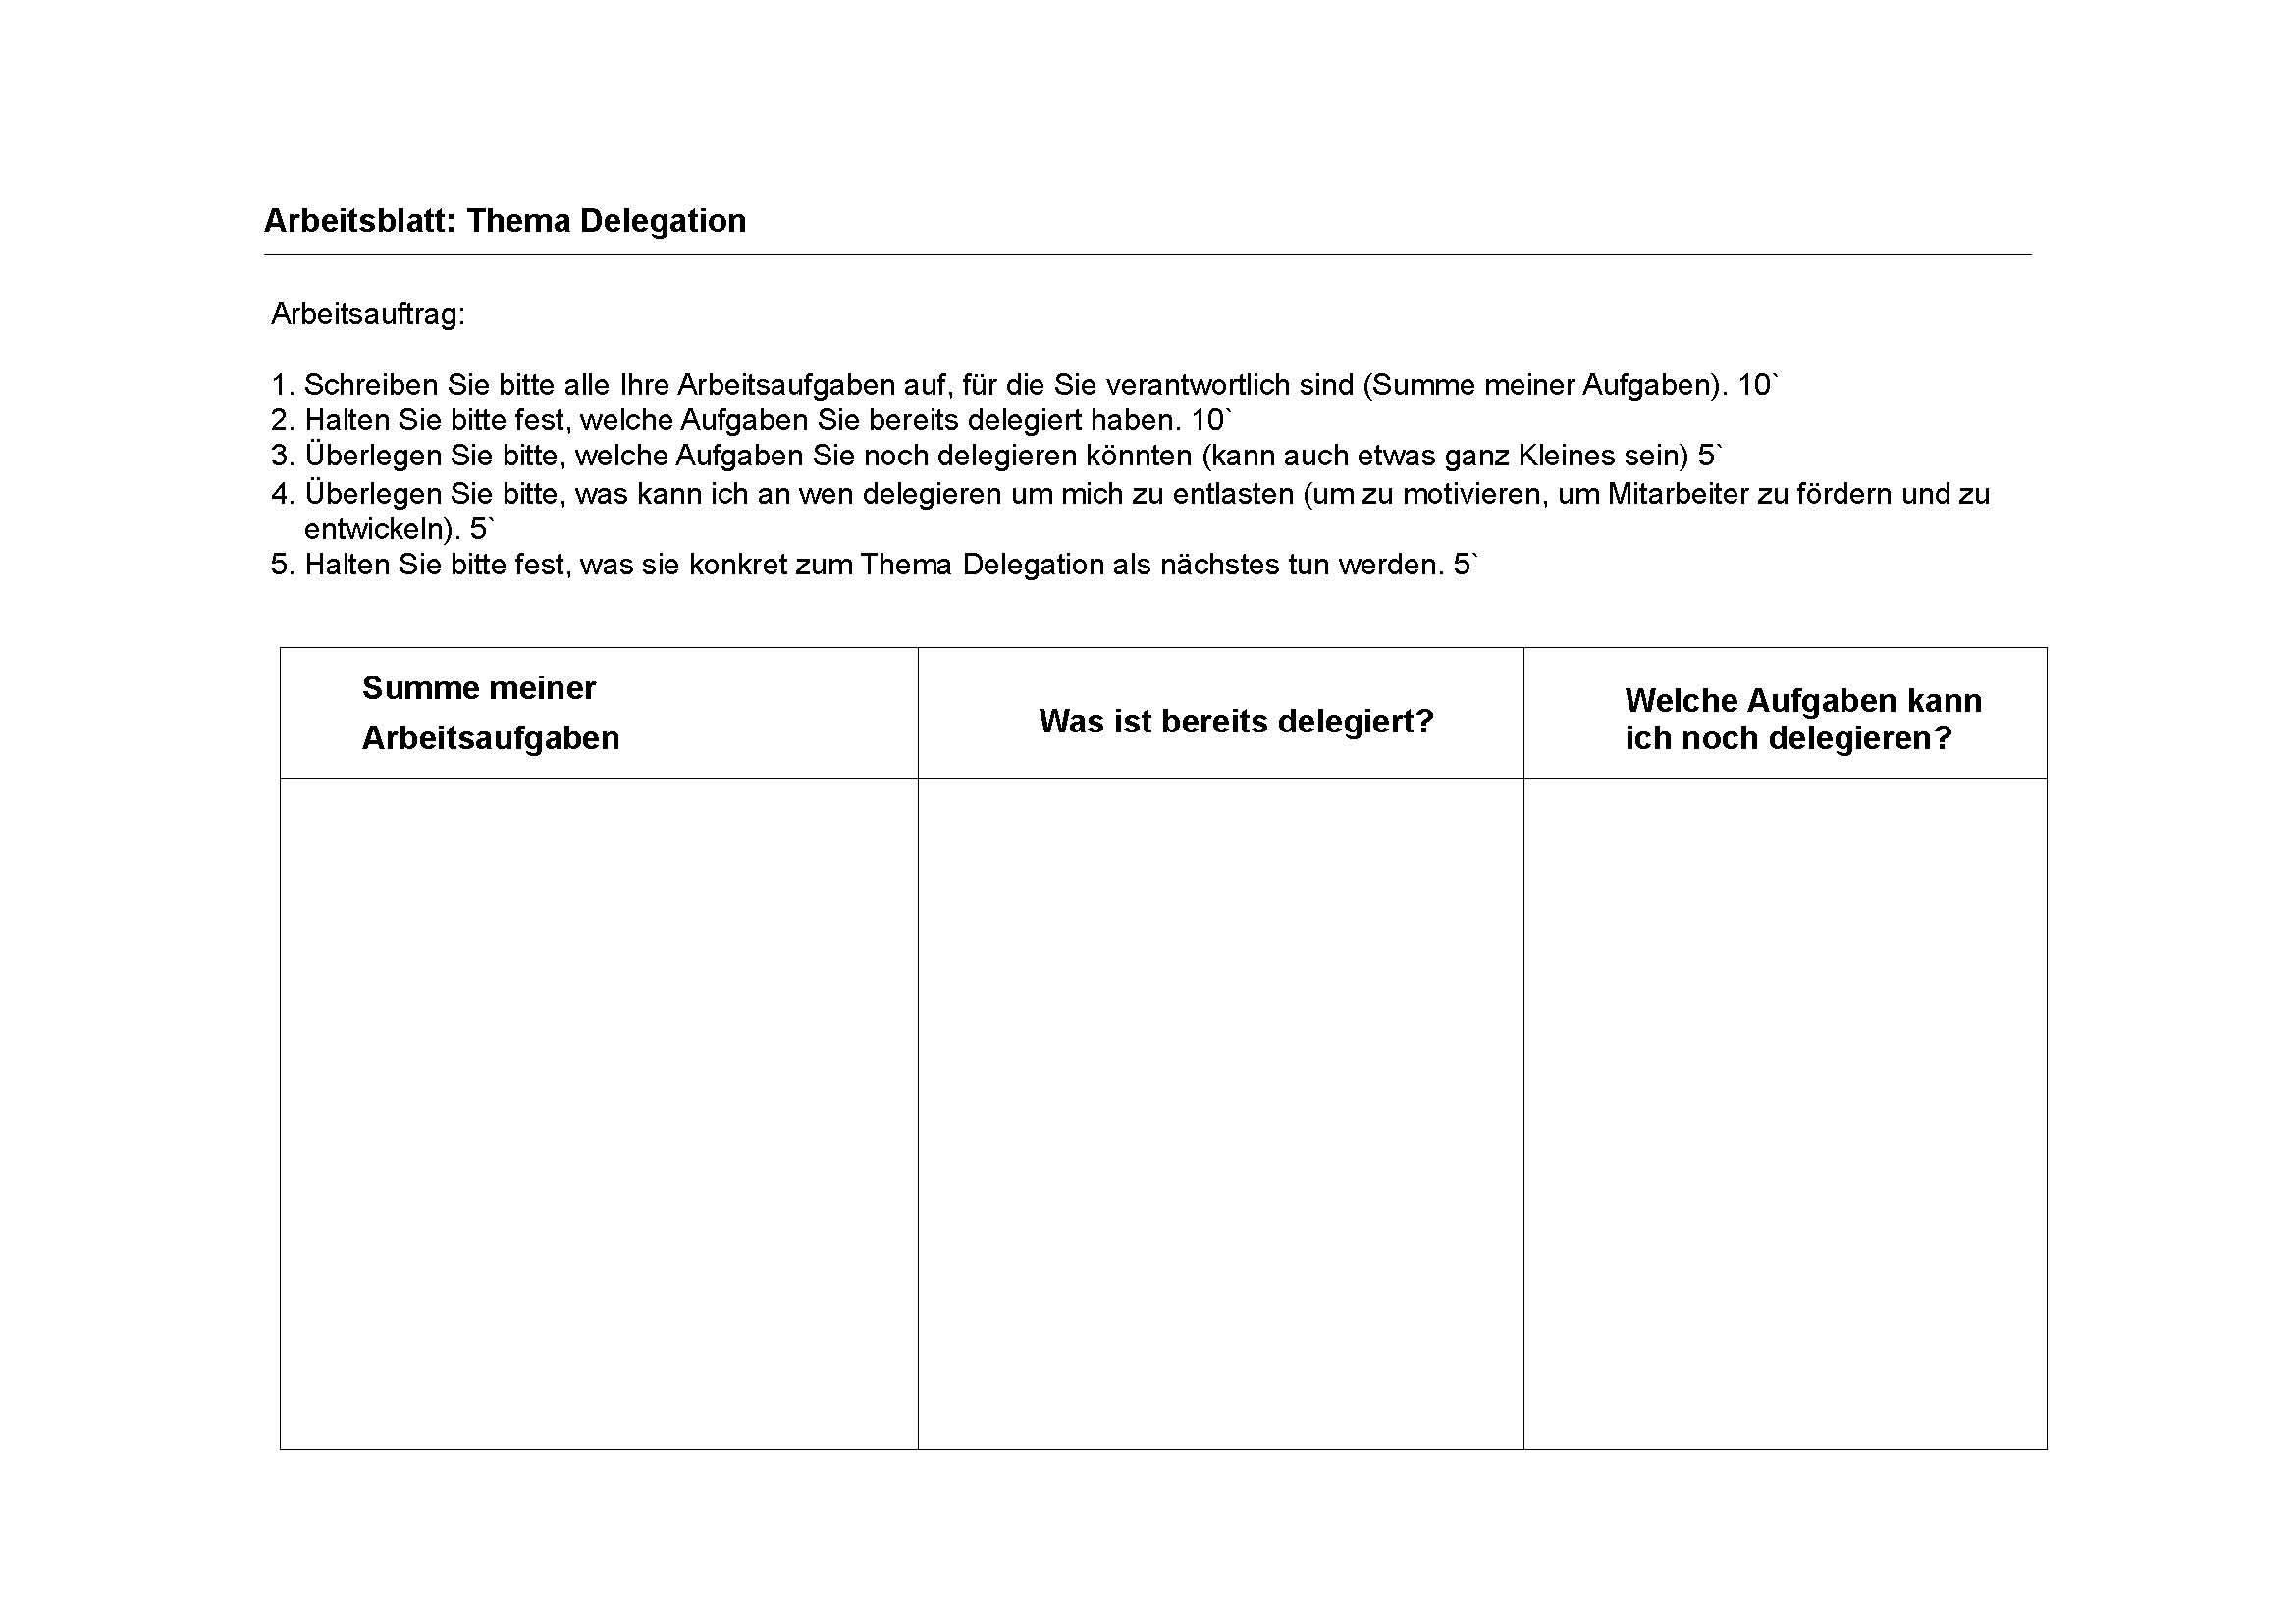 Skills - Arbeitsblatt: Thema Delegation